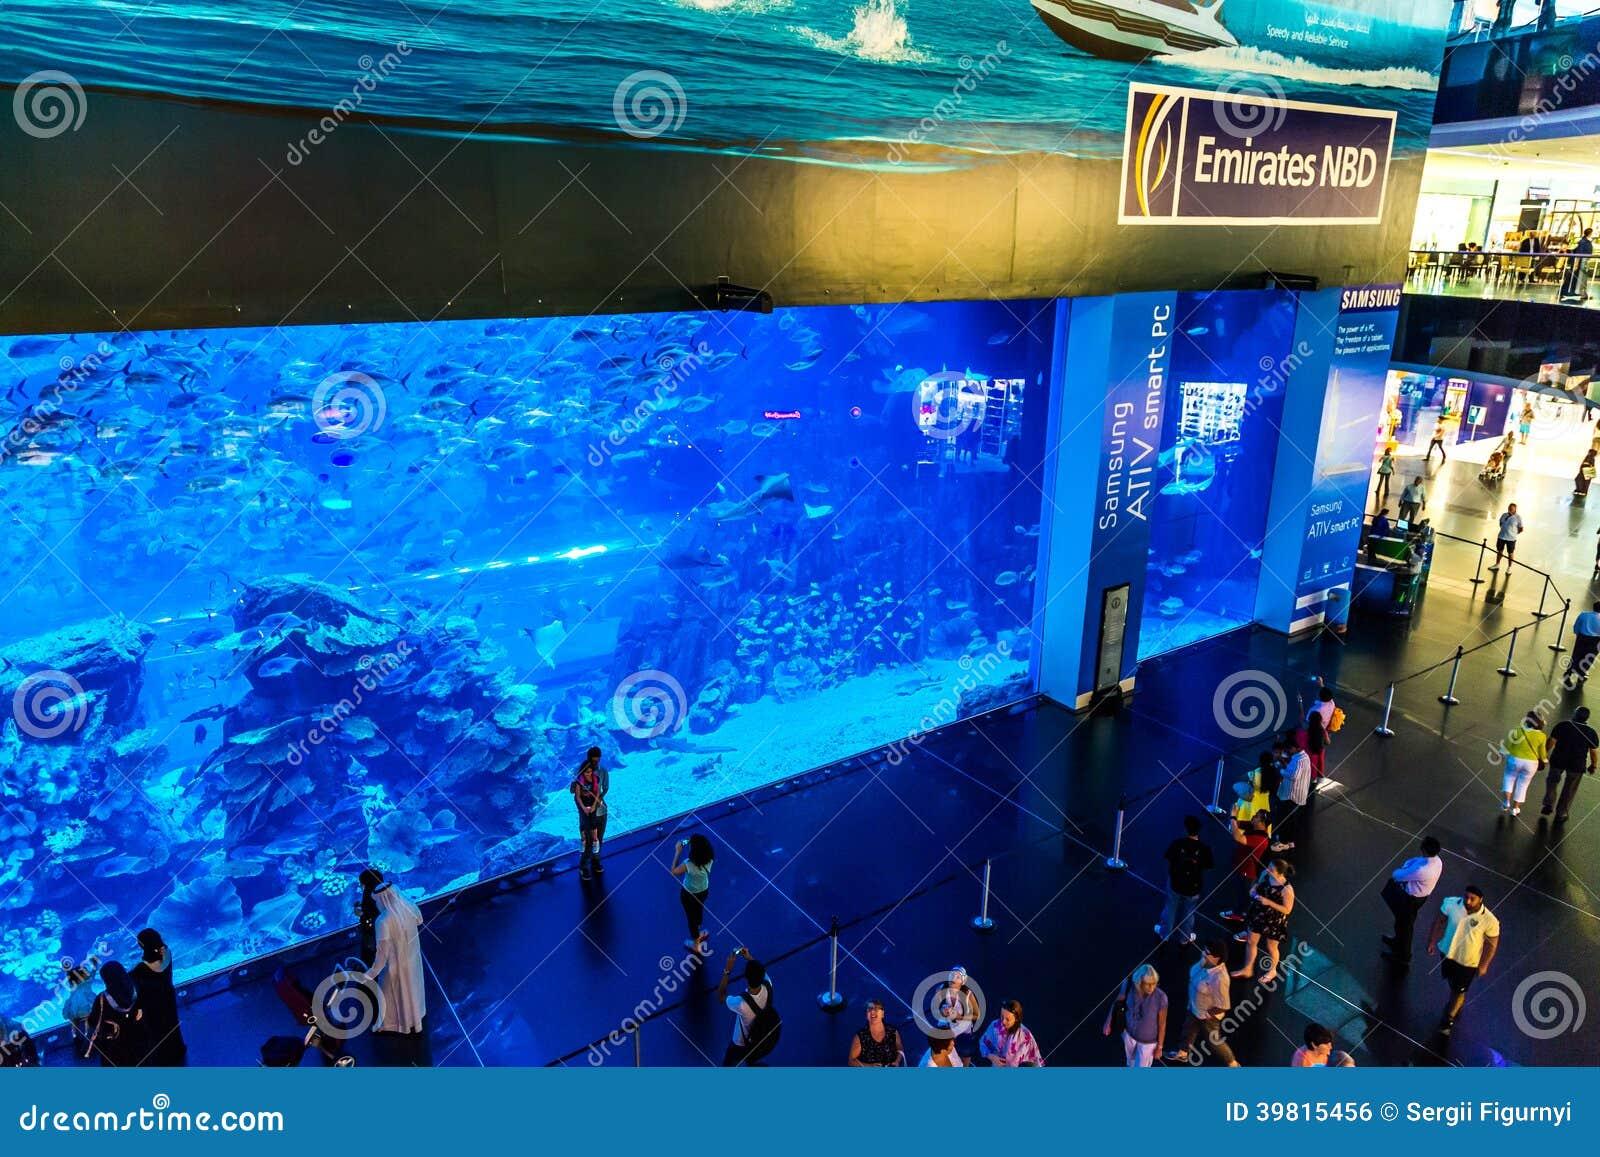 gr tes aquarium der welt in dubai mall redaktionelles foto bild 39815456. Black Bedroom Furniture Sets. Home Design Ideas